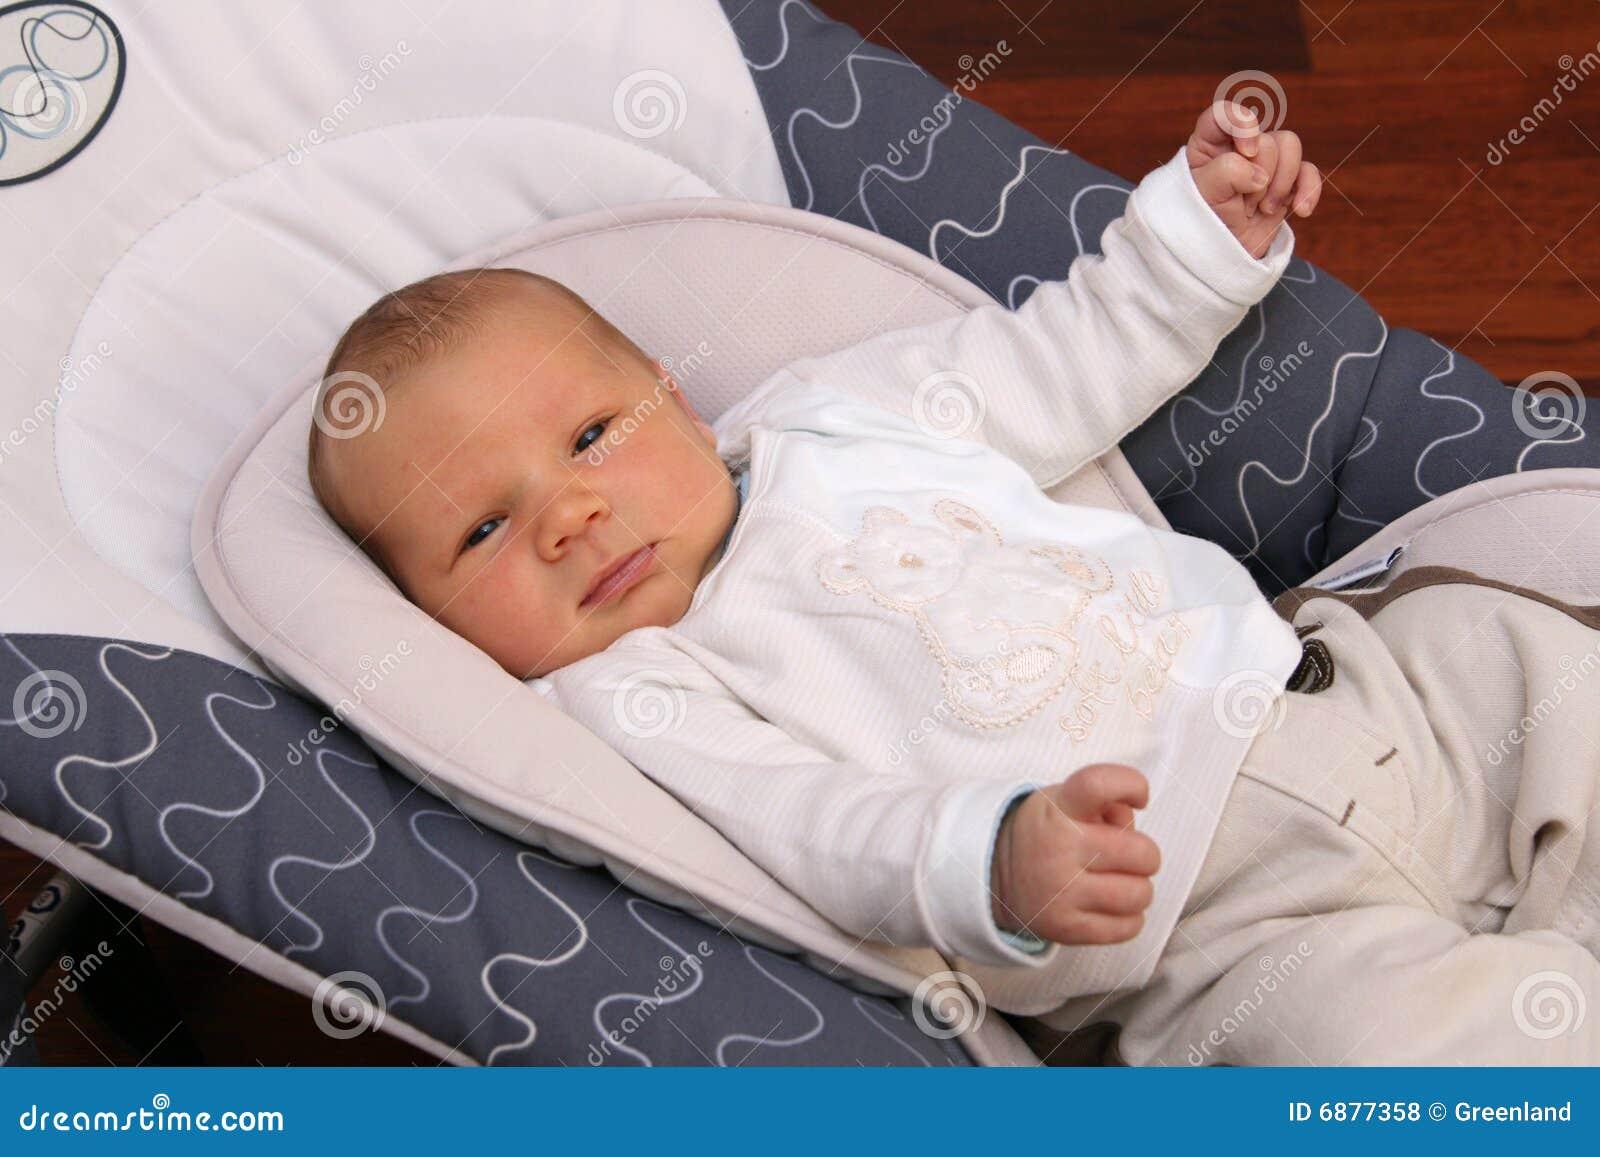 ca78c24b5828 Newborn Baby Lying In Bouncer Chair Stock Photo - Image of health ...